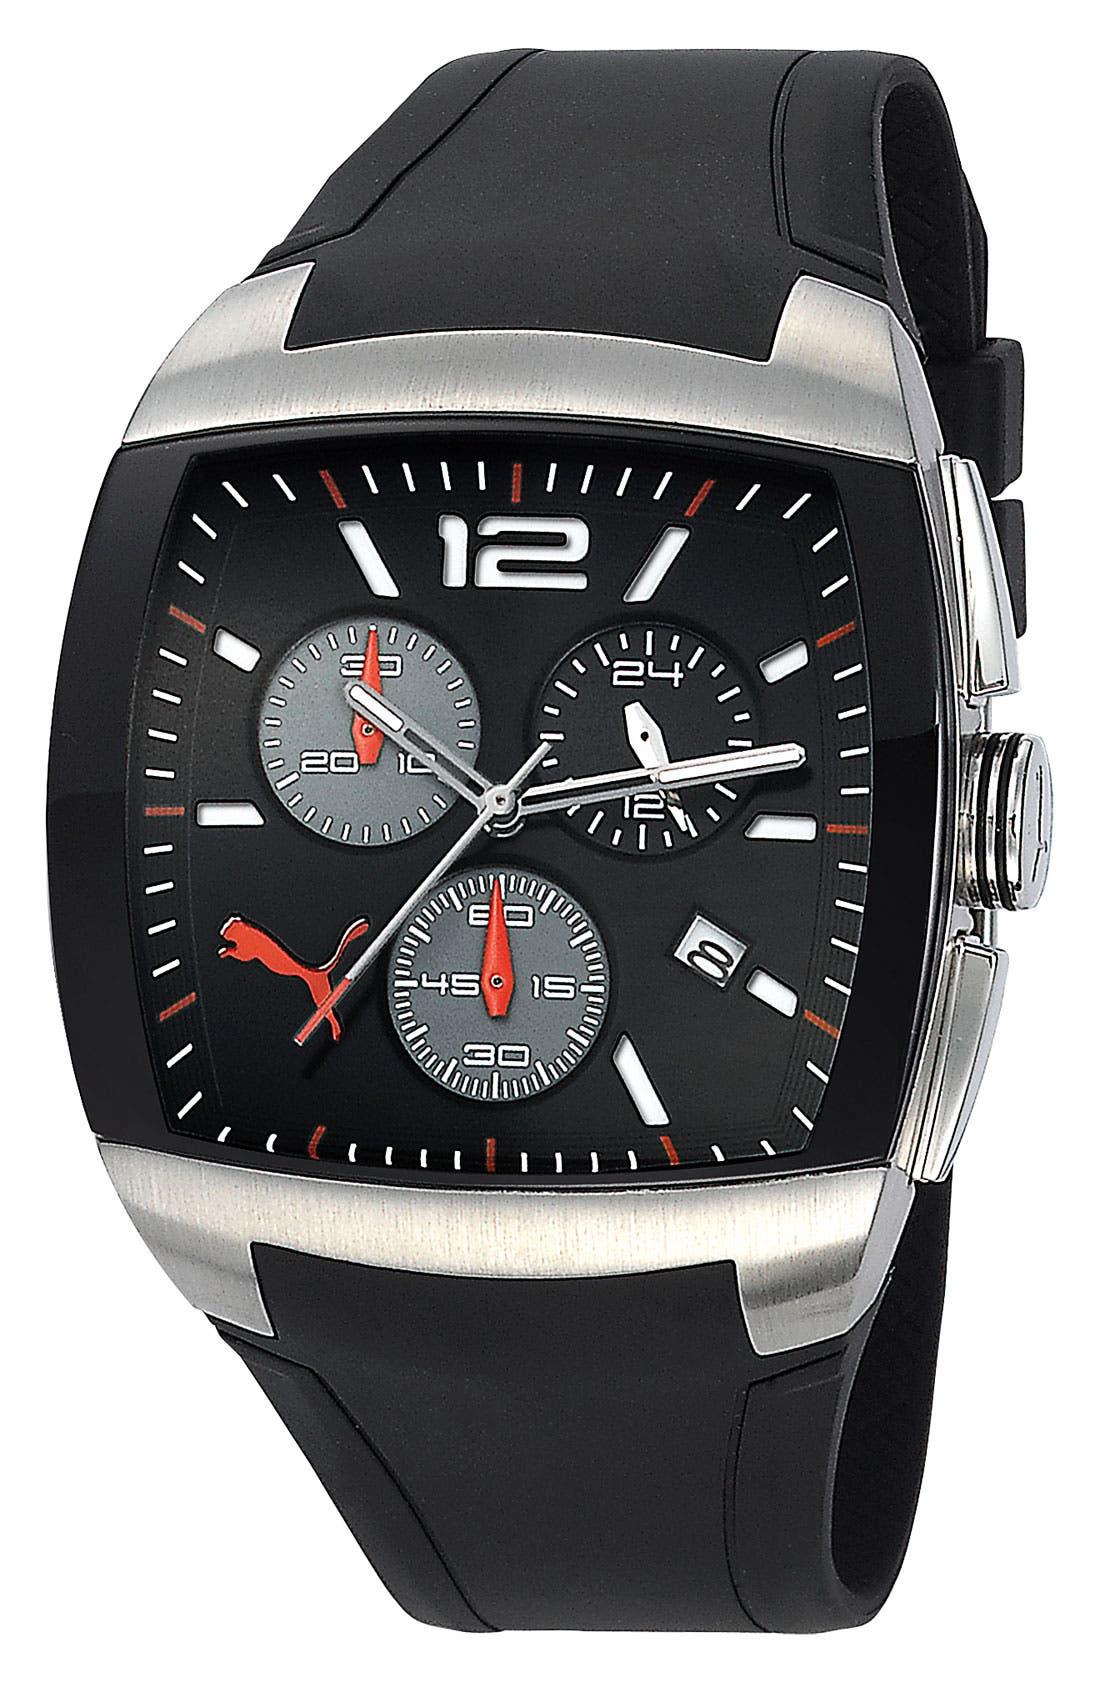 Main Image - PUMA 'GT Chronograph' Analog Watch, 44mm